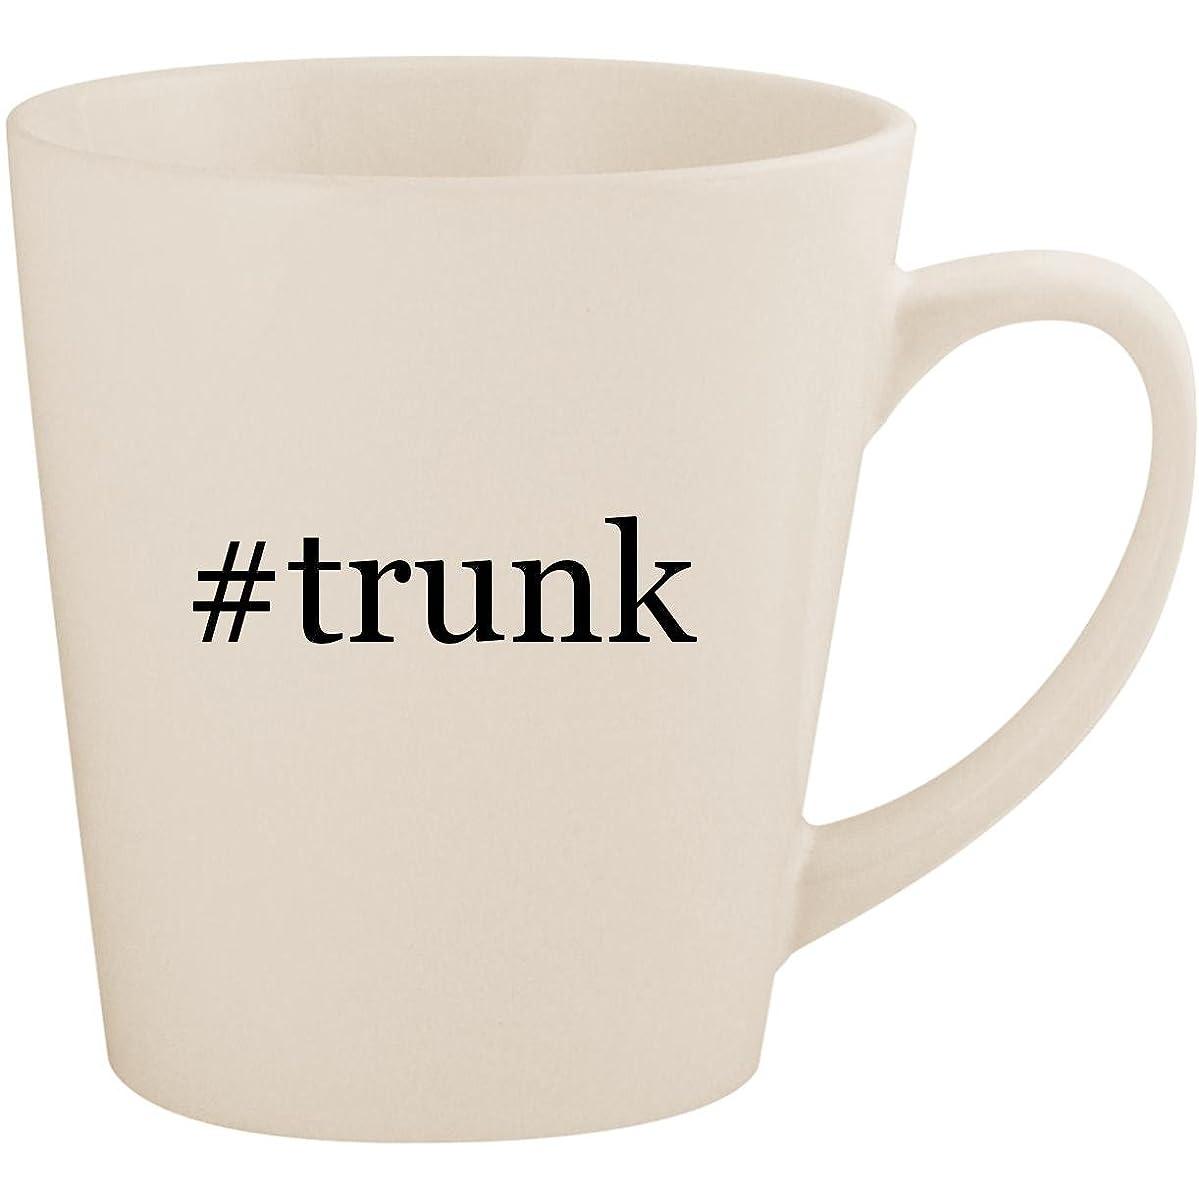 #trunk - White Hashtag 12oz Ceramic Latte Mug Cup